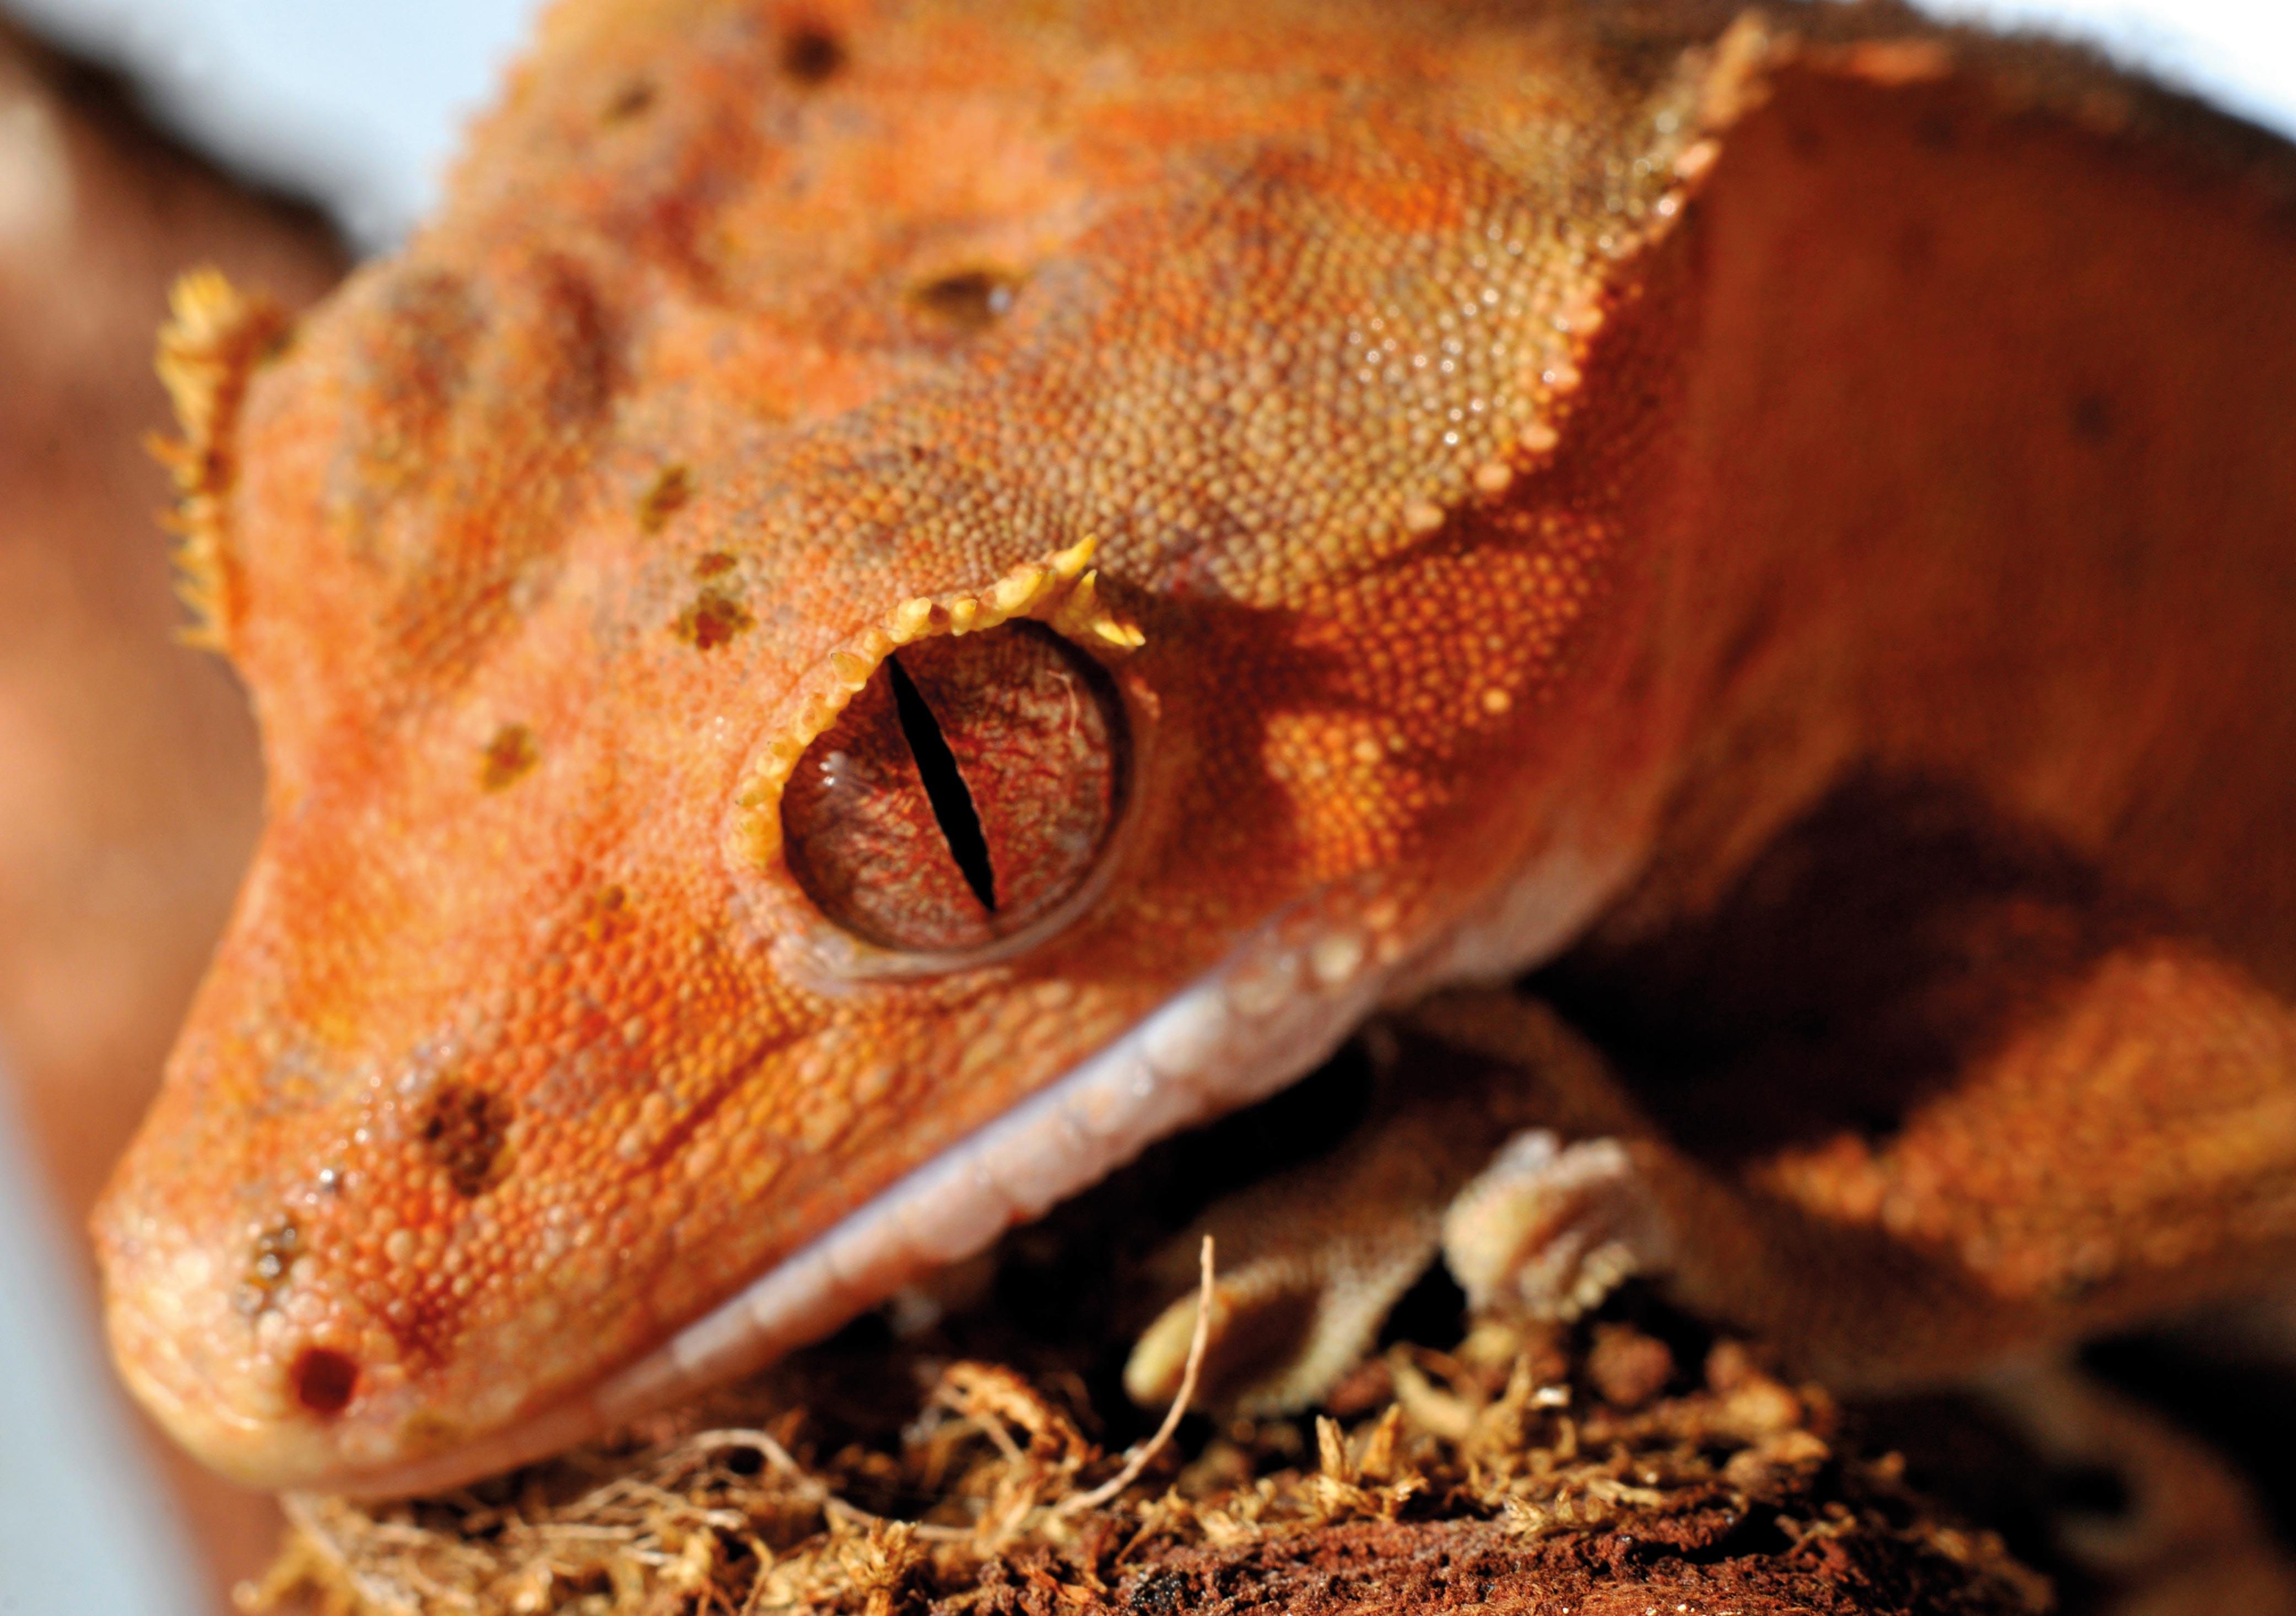 Gecko_HD5